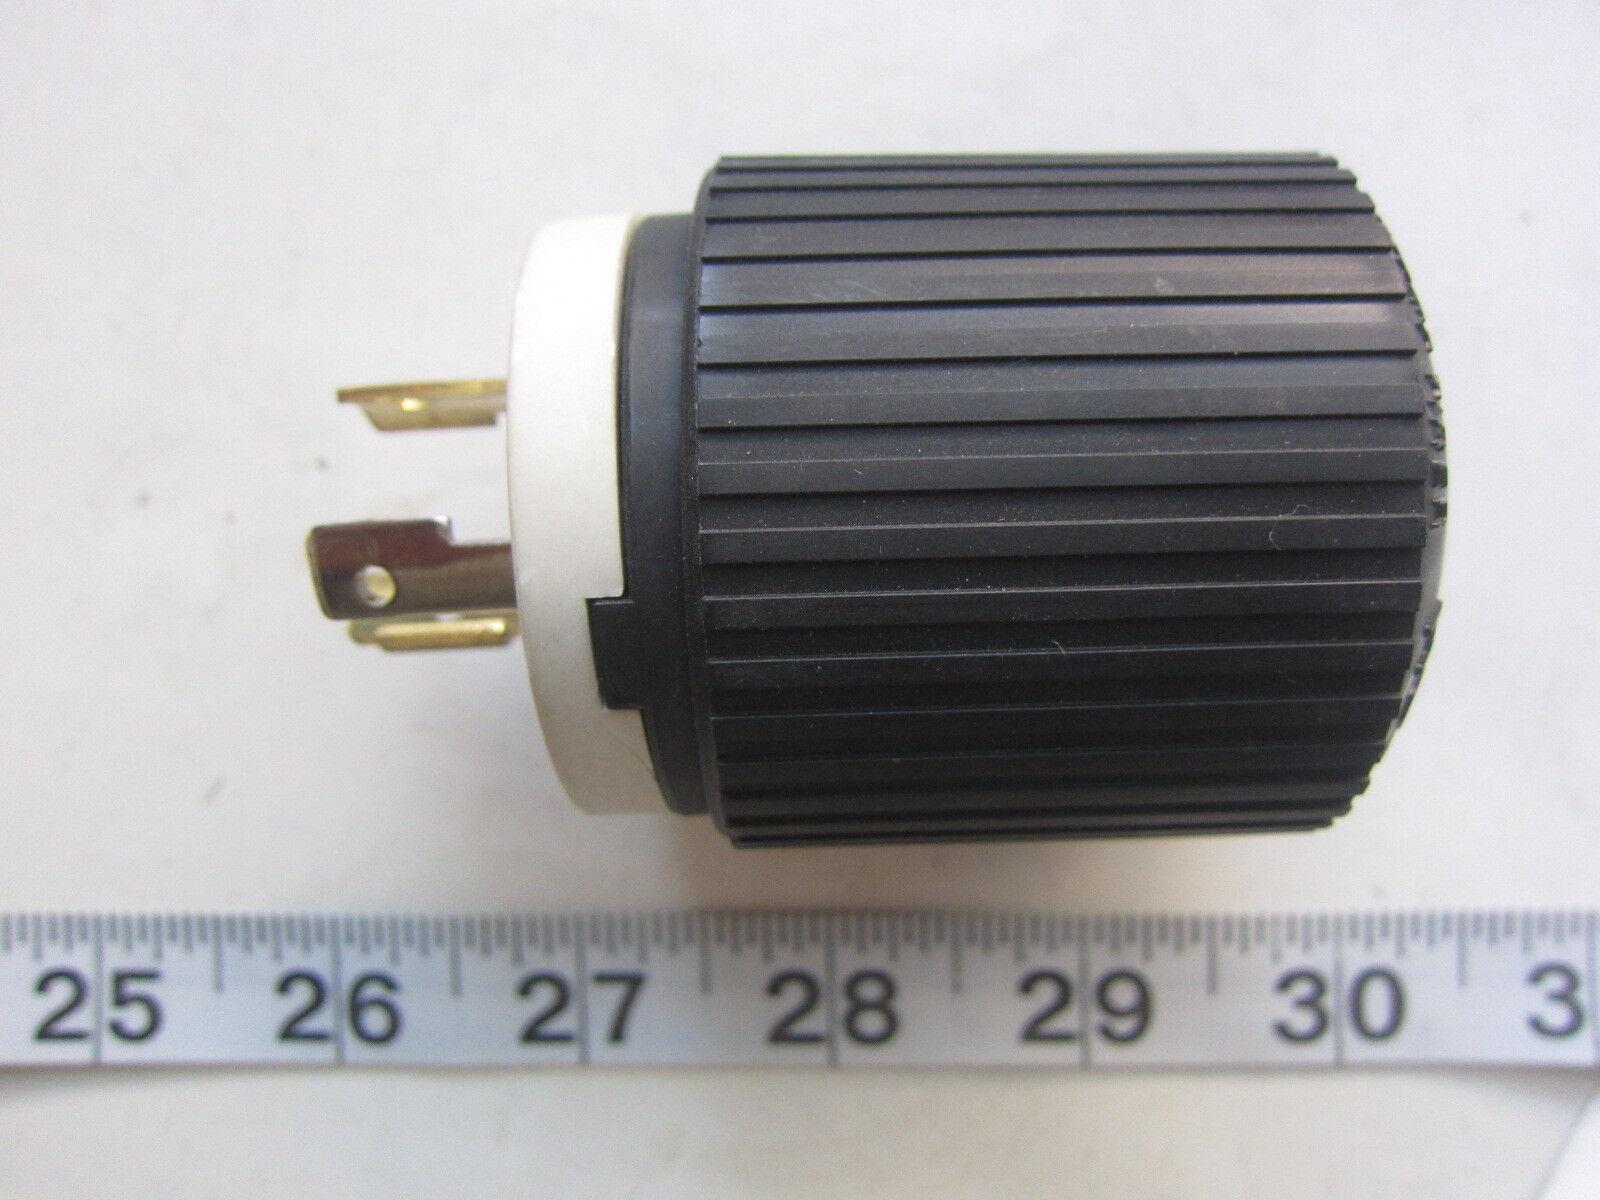 Hubbell Hbl2311 Nema L5 20p Ac Plug Wiring